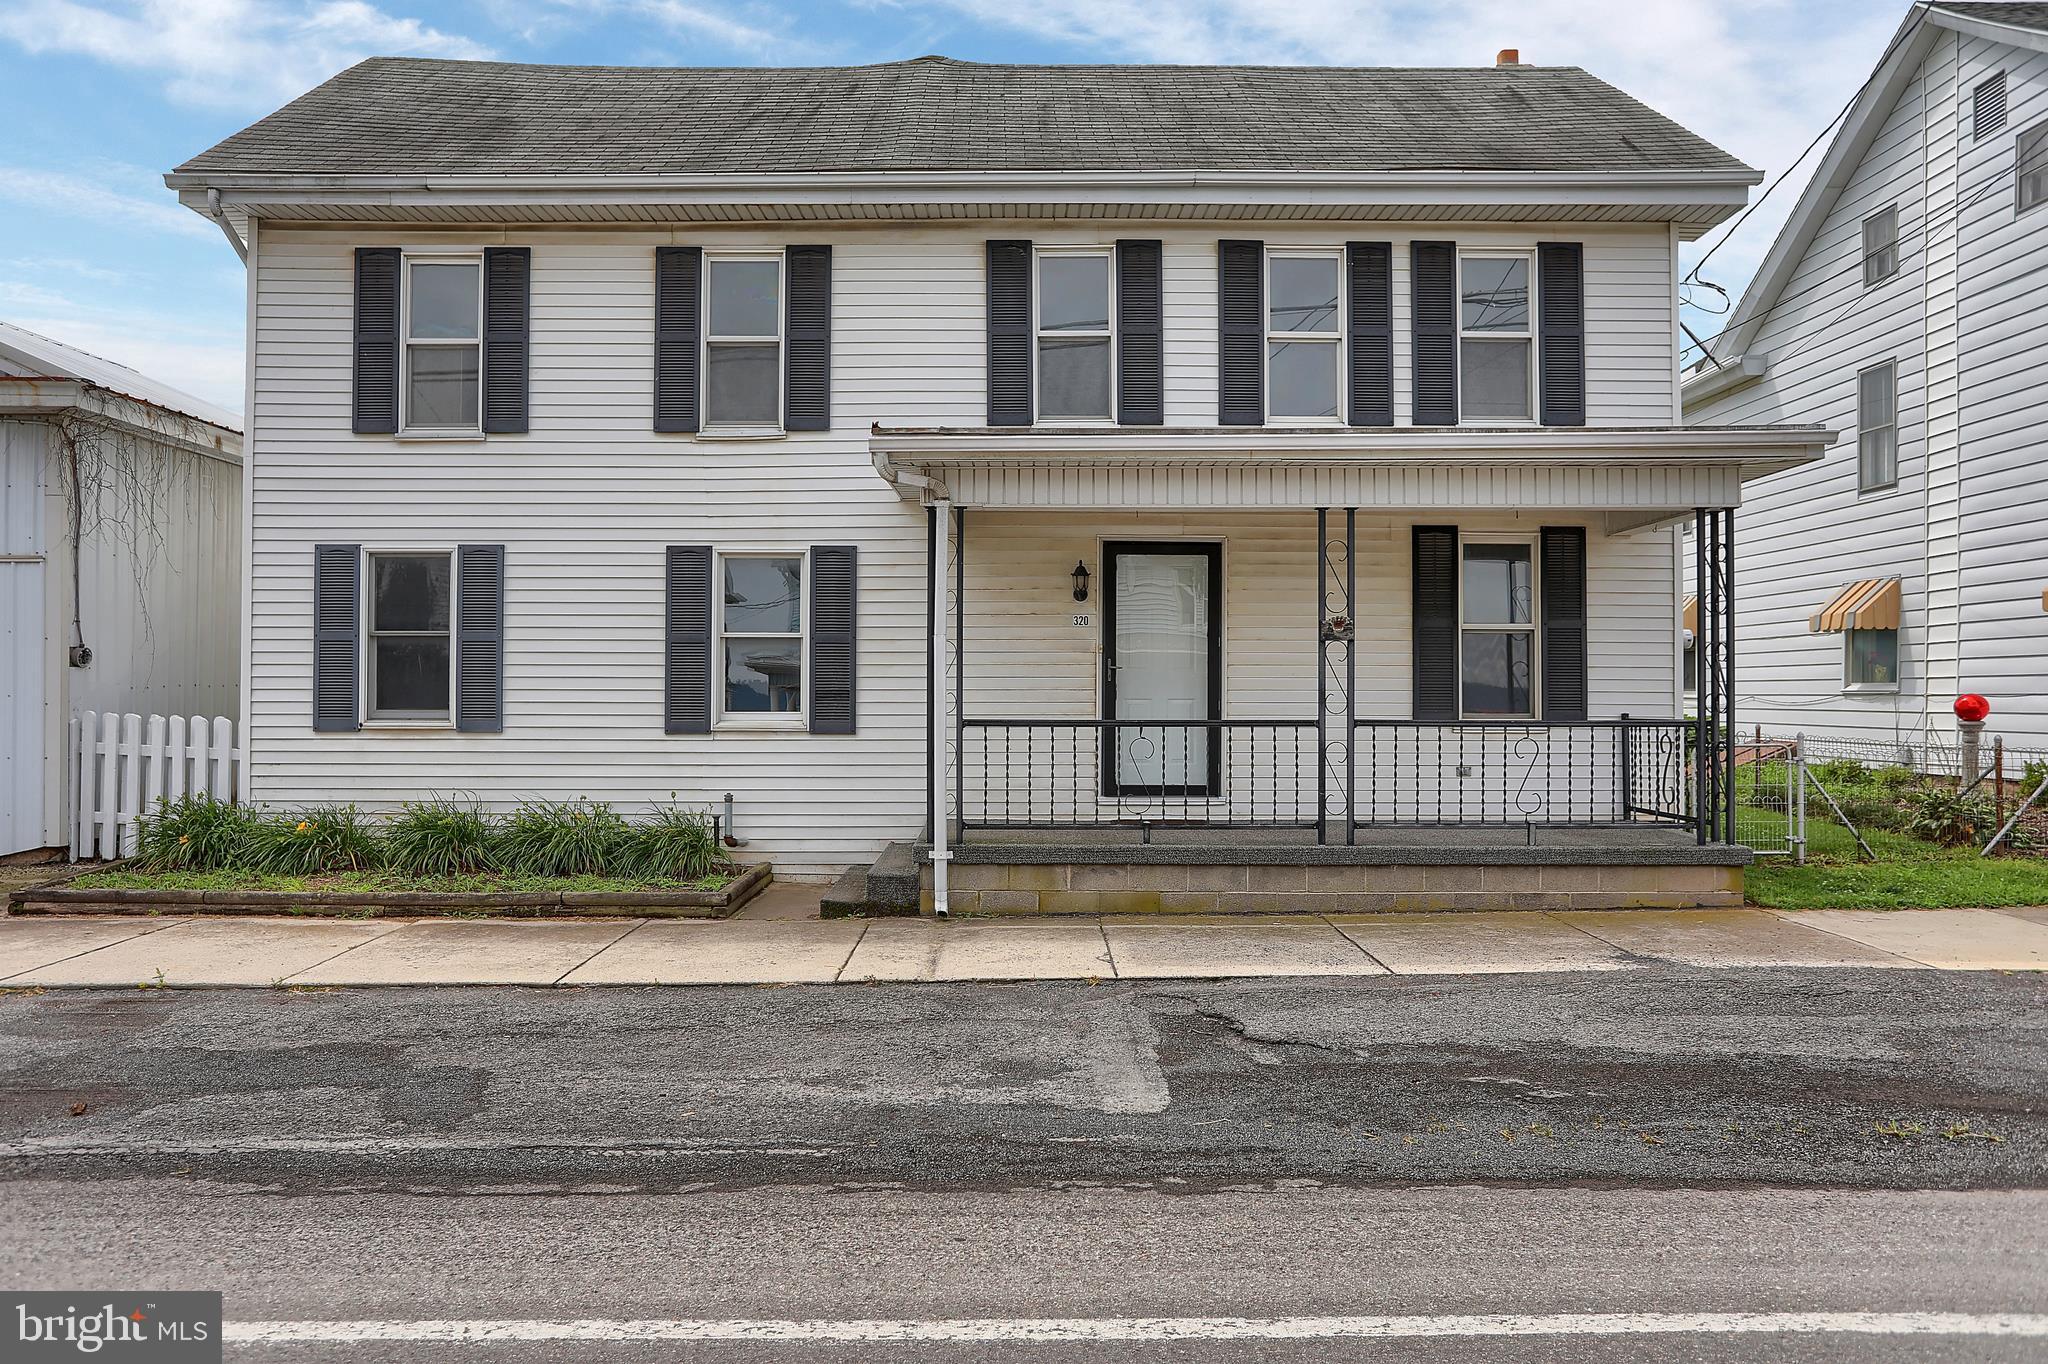 320 E MARKET STREET, GRATZ, PA 17030